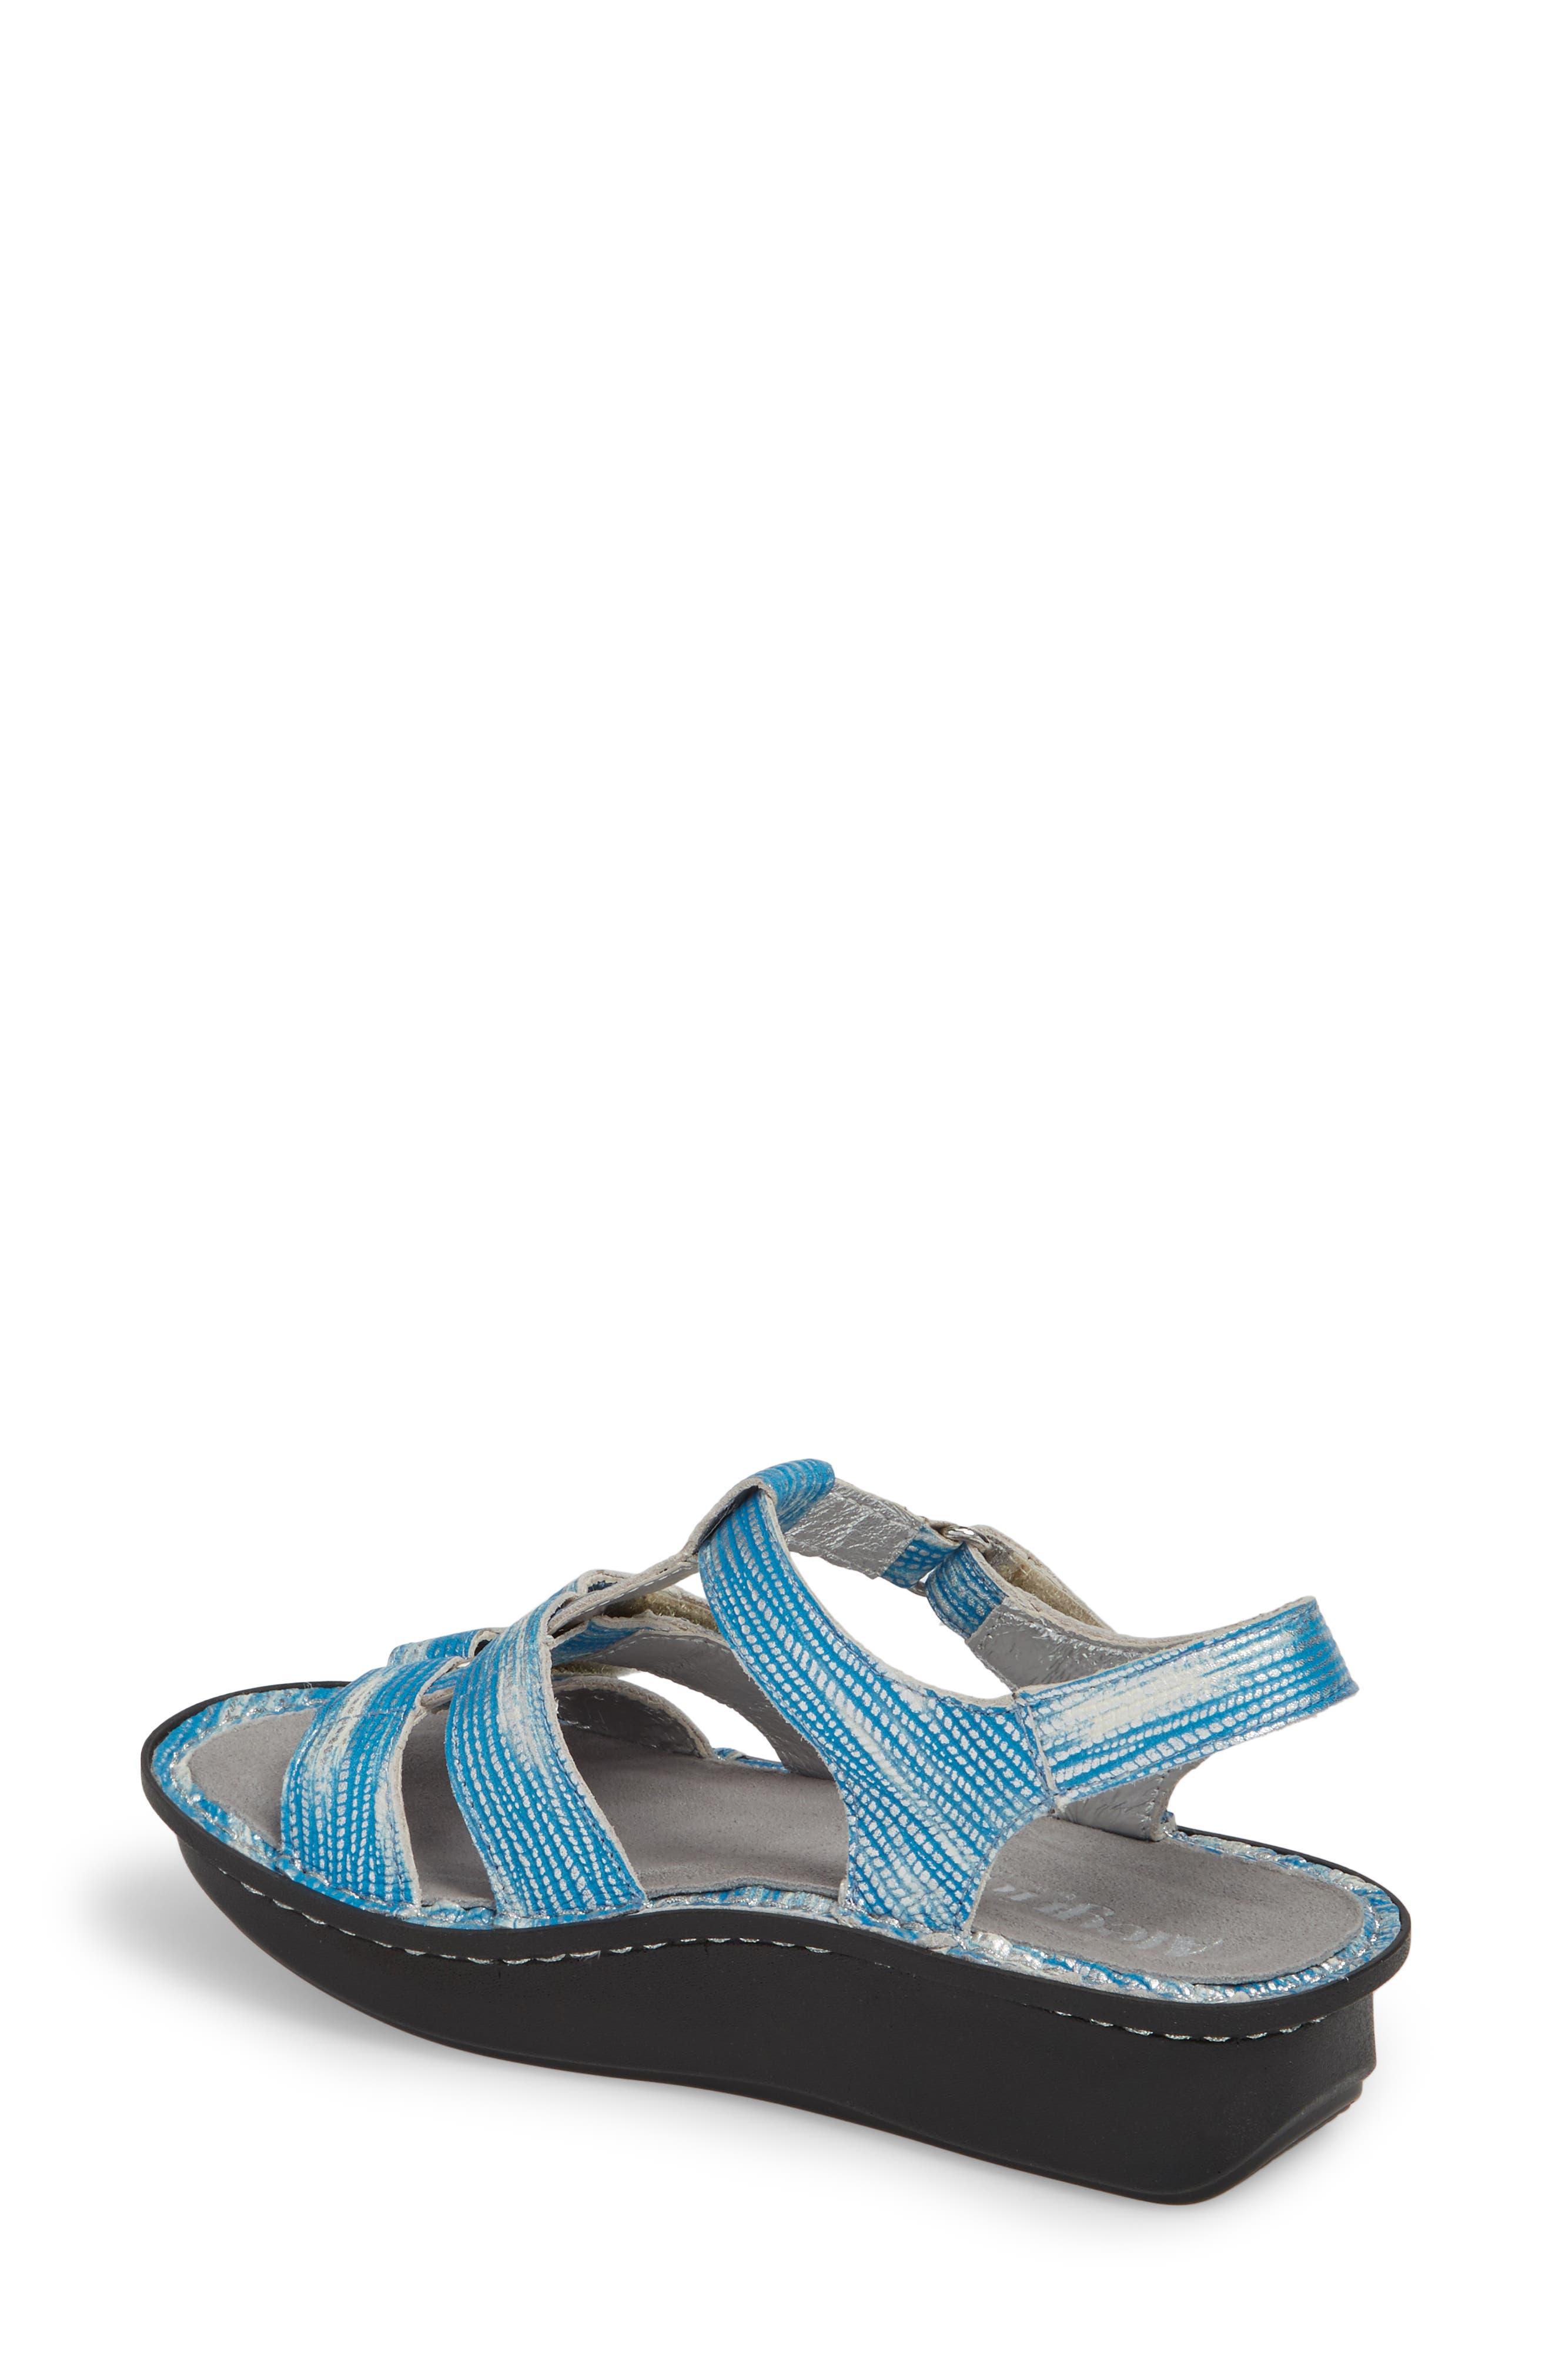 'Kleo' Sandal,                             Alternate thumbnail 2, color,                             Wrapture Blues Leather